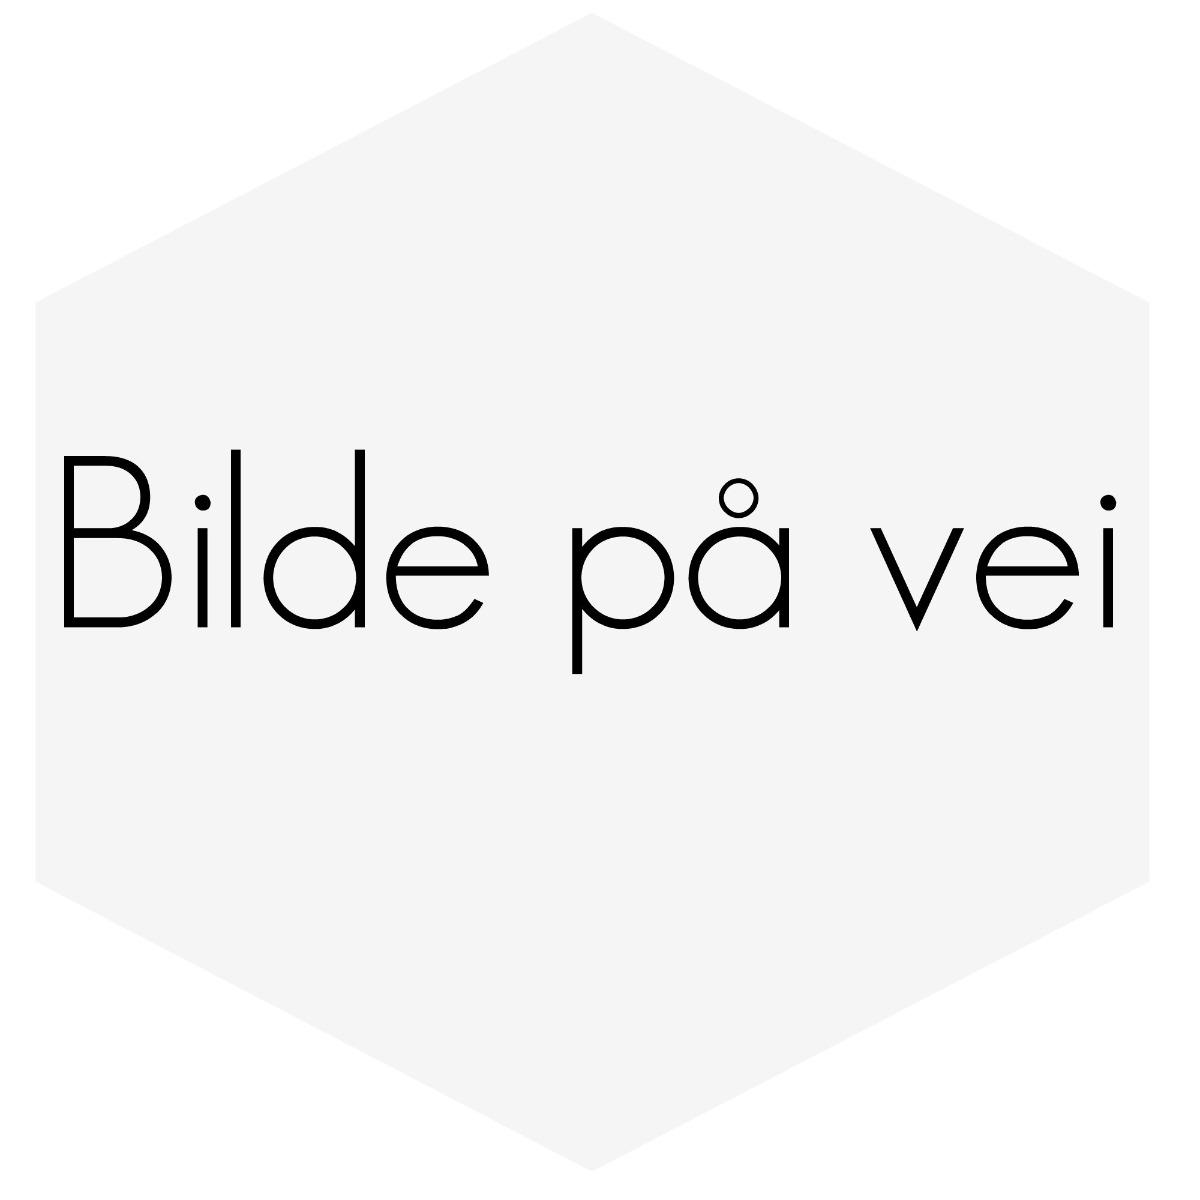 MODELLBIL AMAZON COMBI LYS GRÅ/HVIT 1:43 MINICHAMP